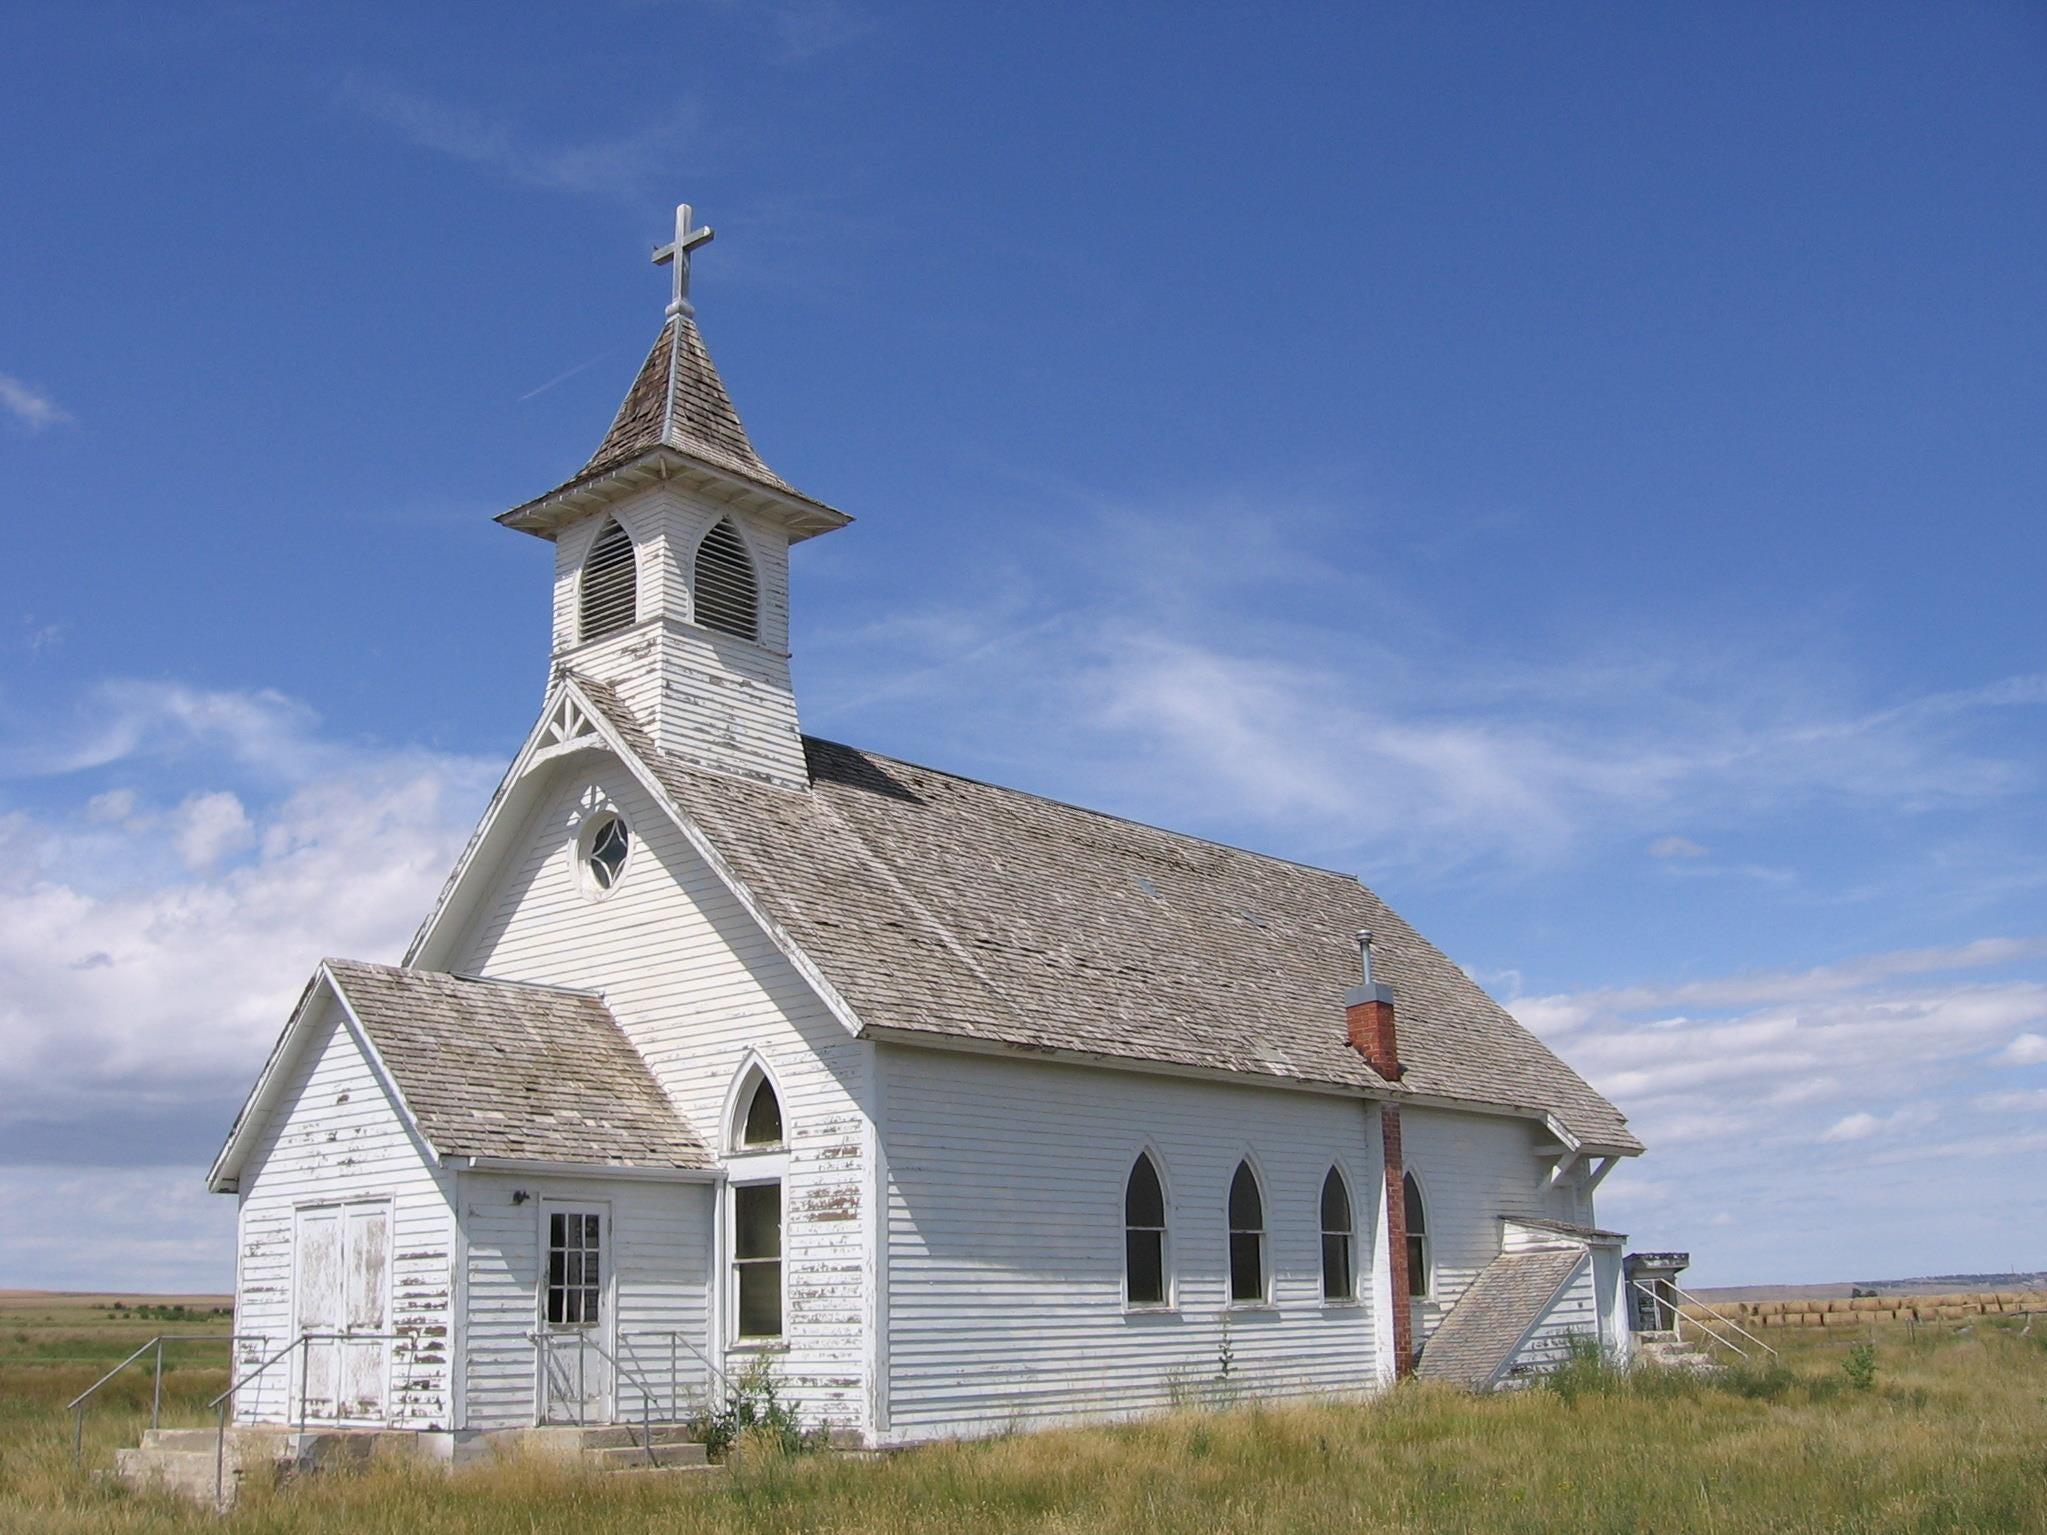 St. Wenceslaus in Danvers, Fergus County